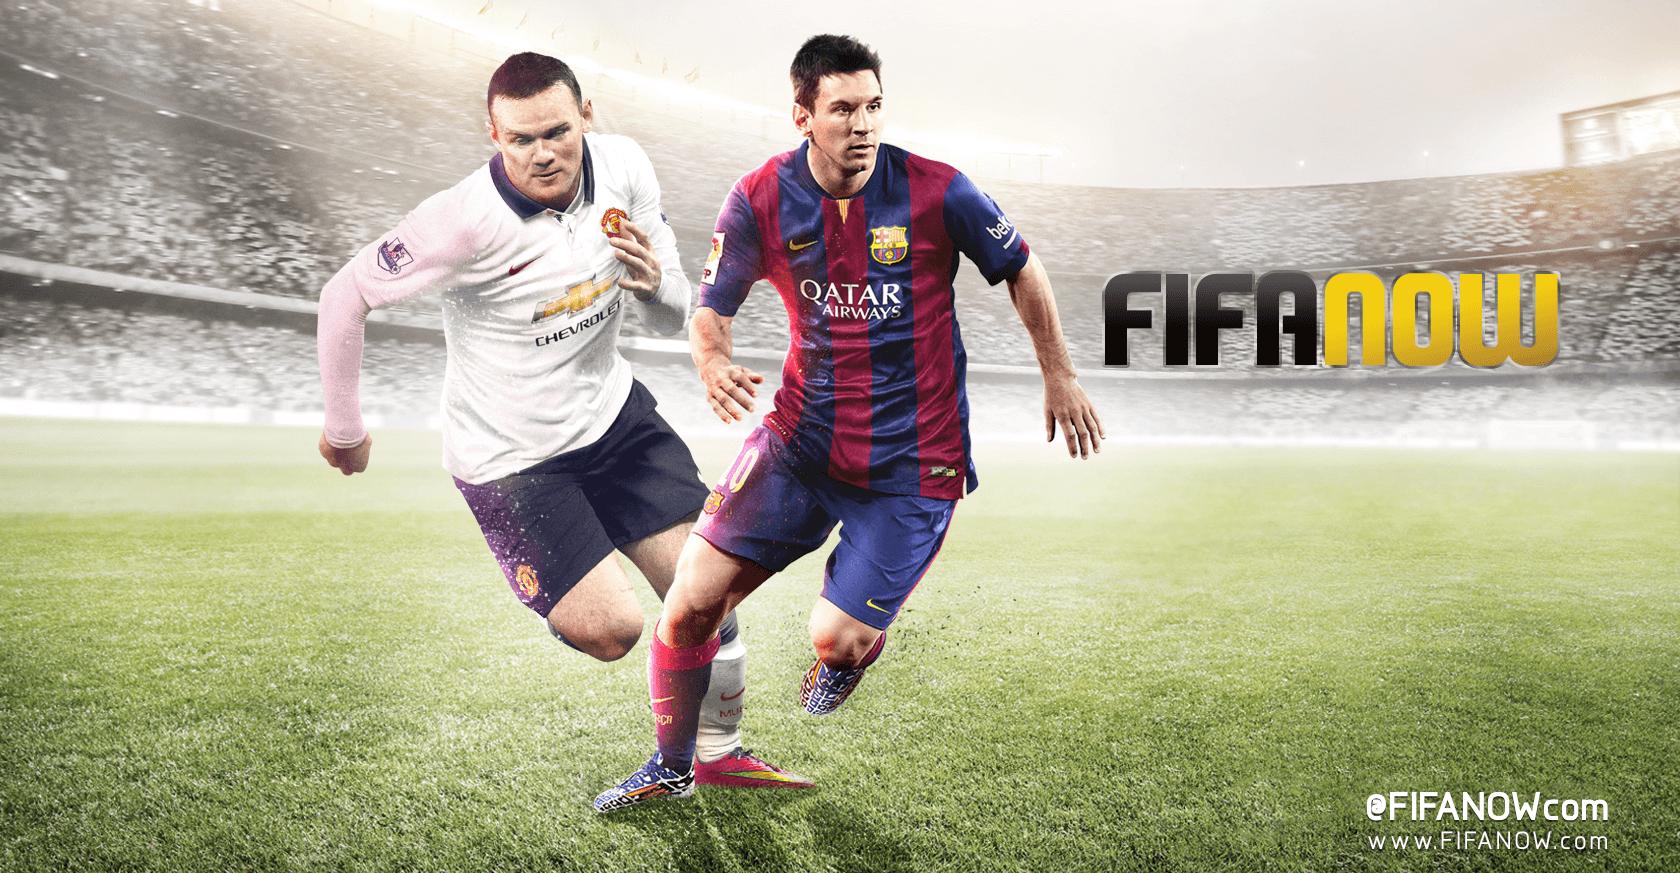 EA <b>FIFA 15</b> - Eden Hazard <b>HD</b> desktop <b>wallpaper</b> : High Definition ...